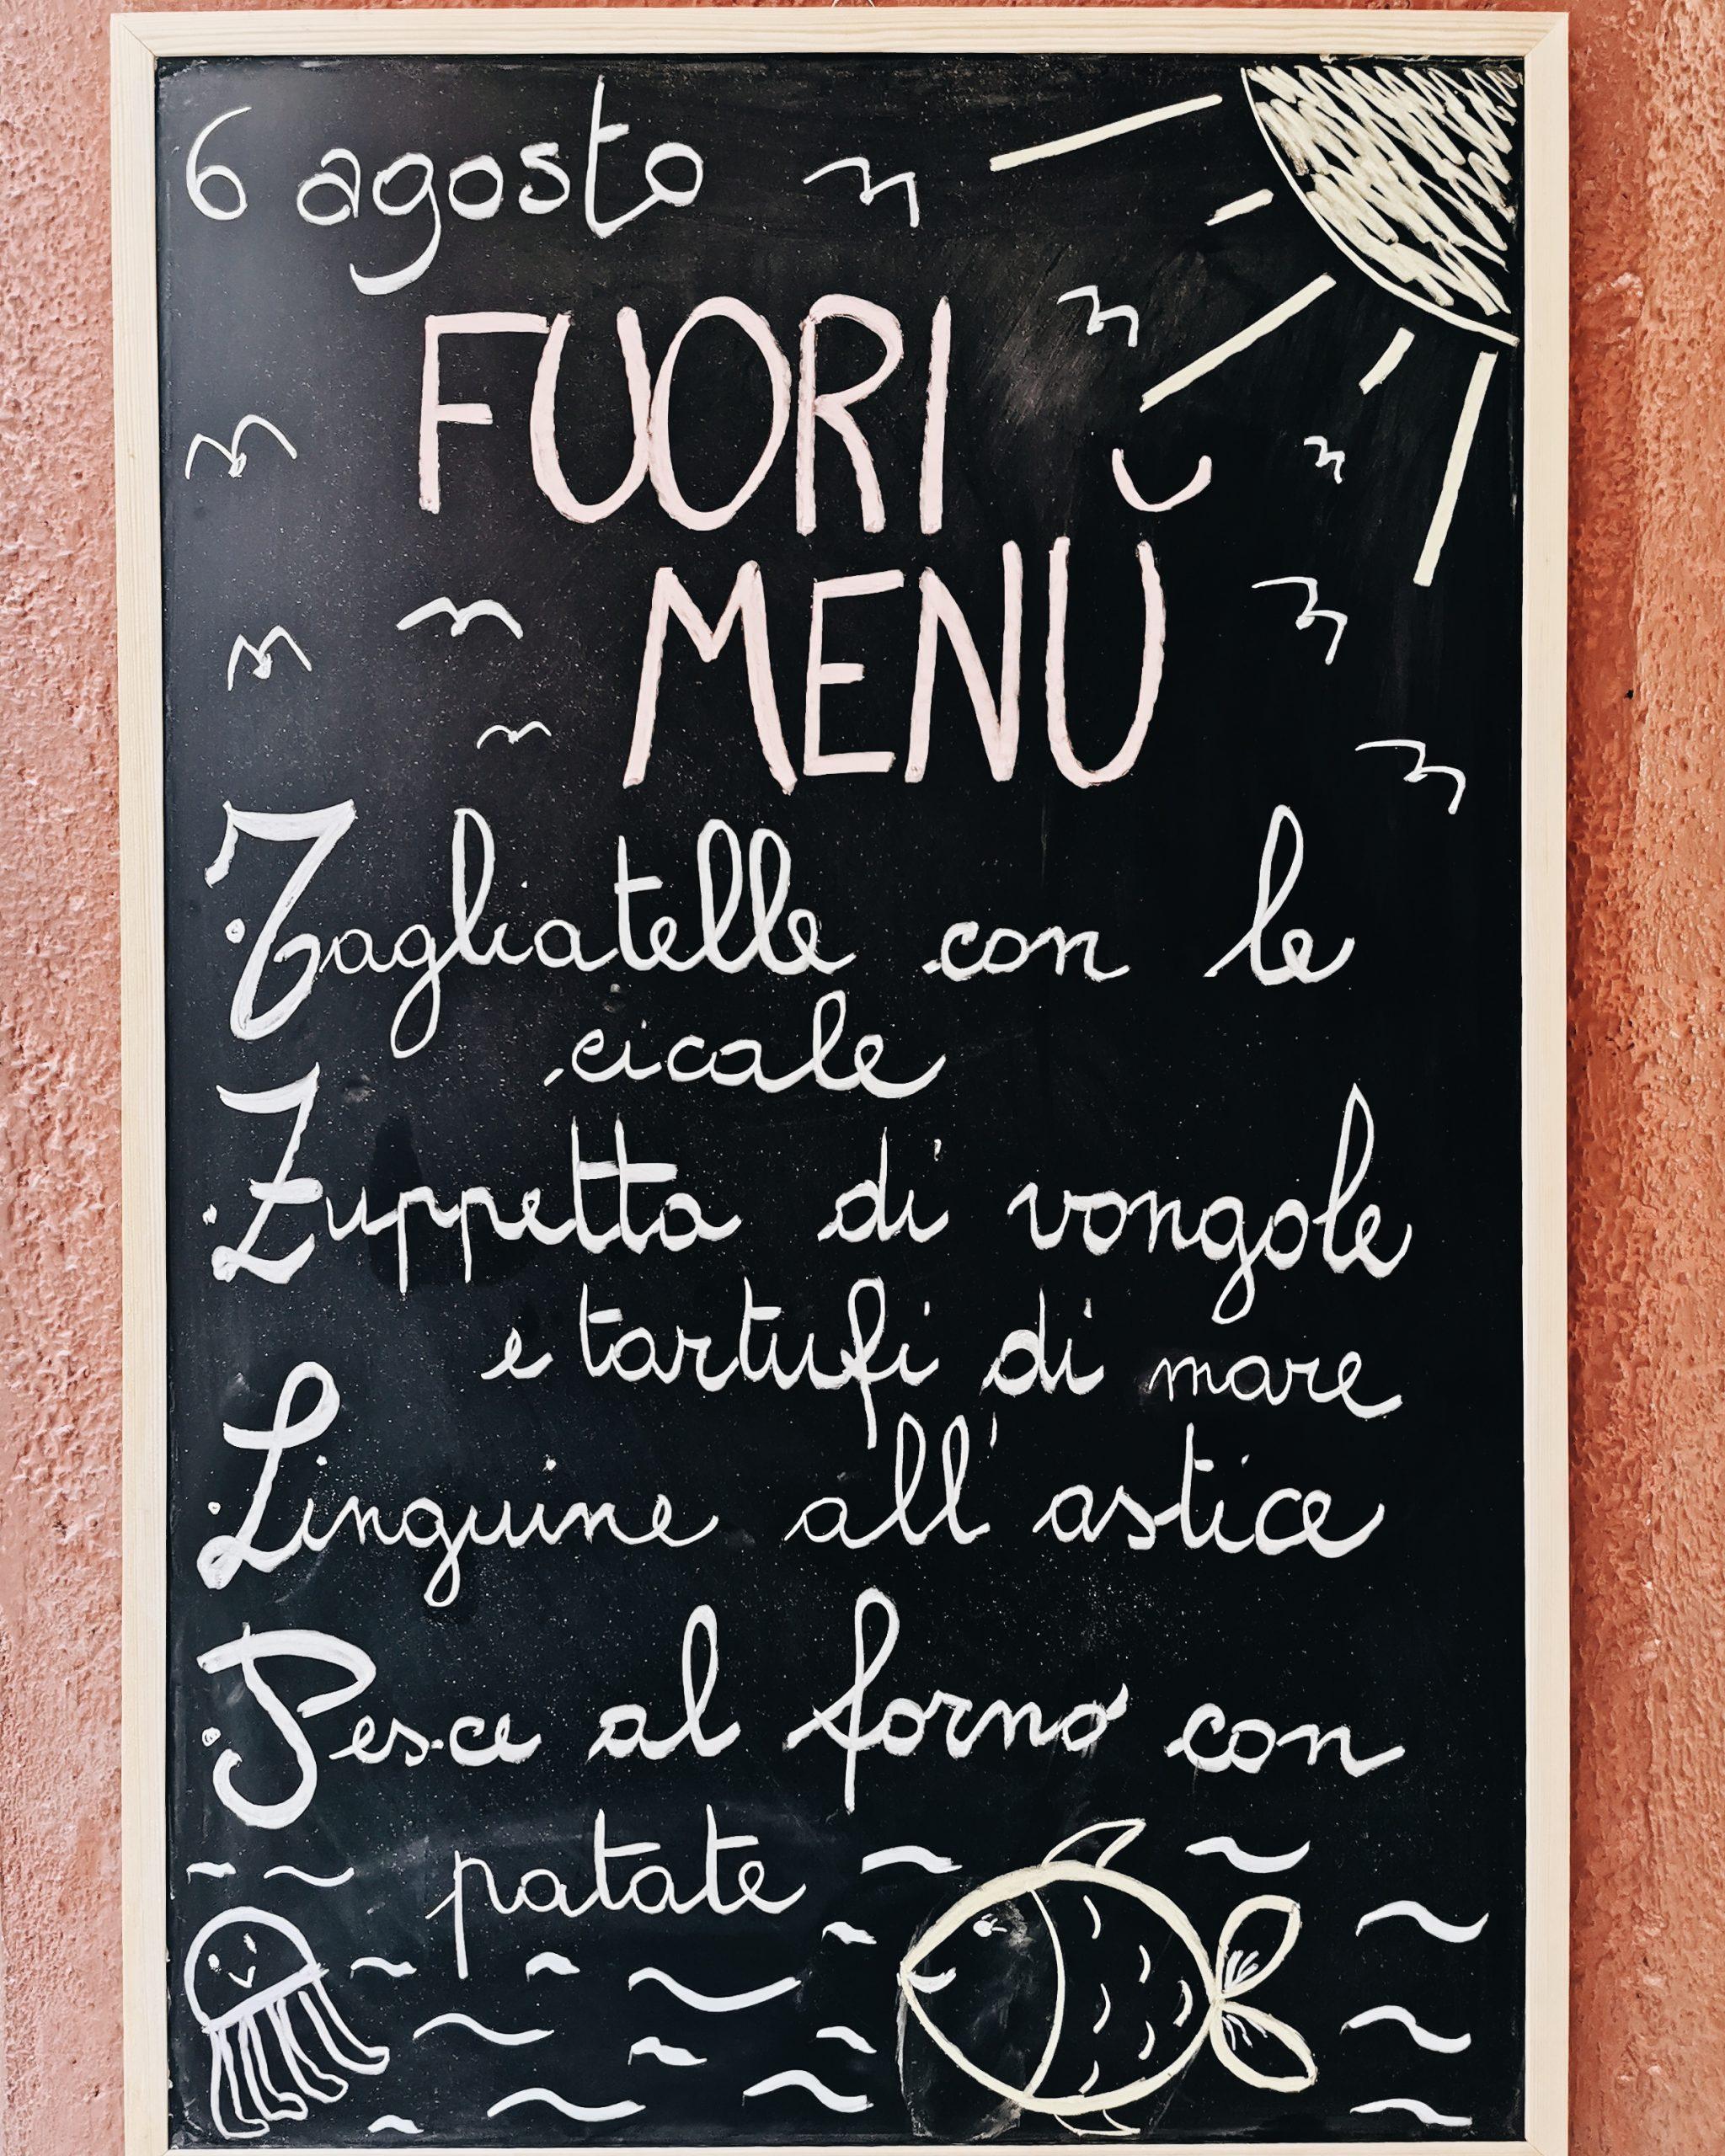 Gianni Franzi menu